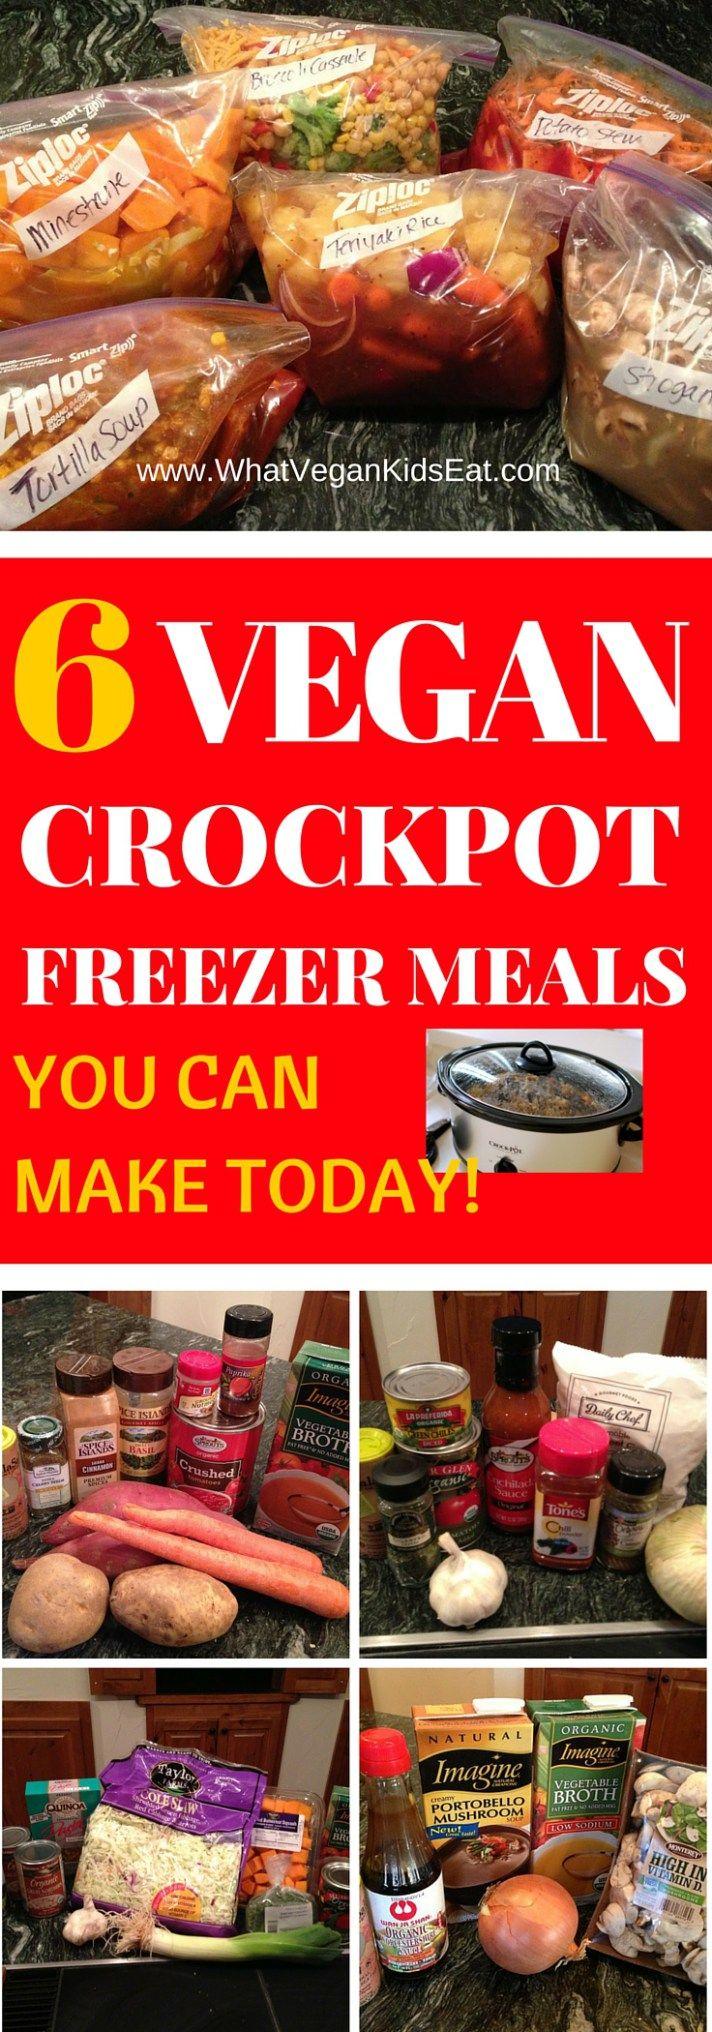 What vegan kids eat - crockpot freezer meals make ahead